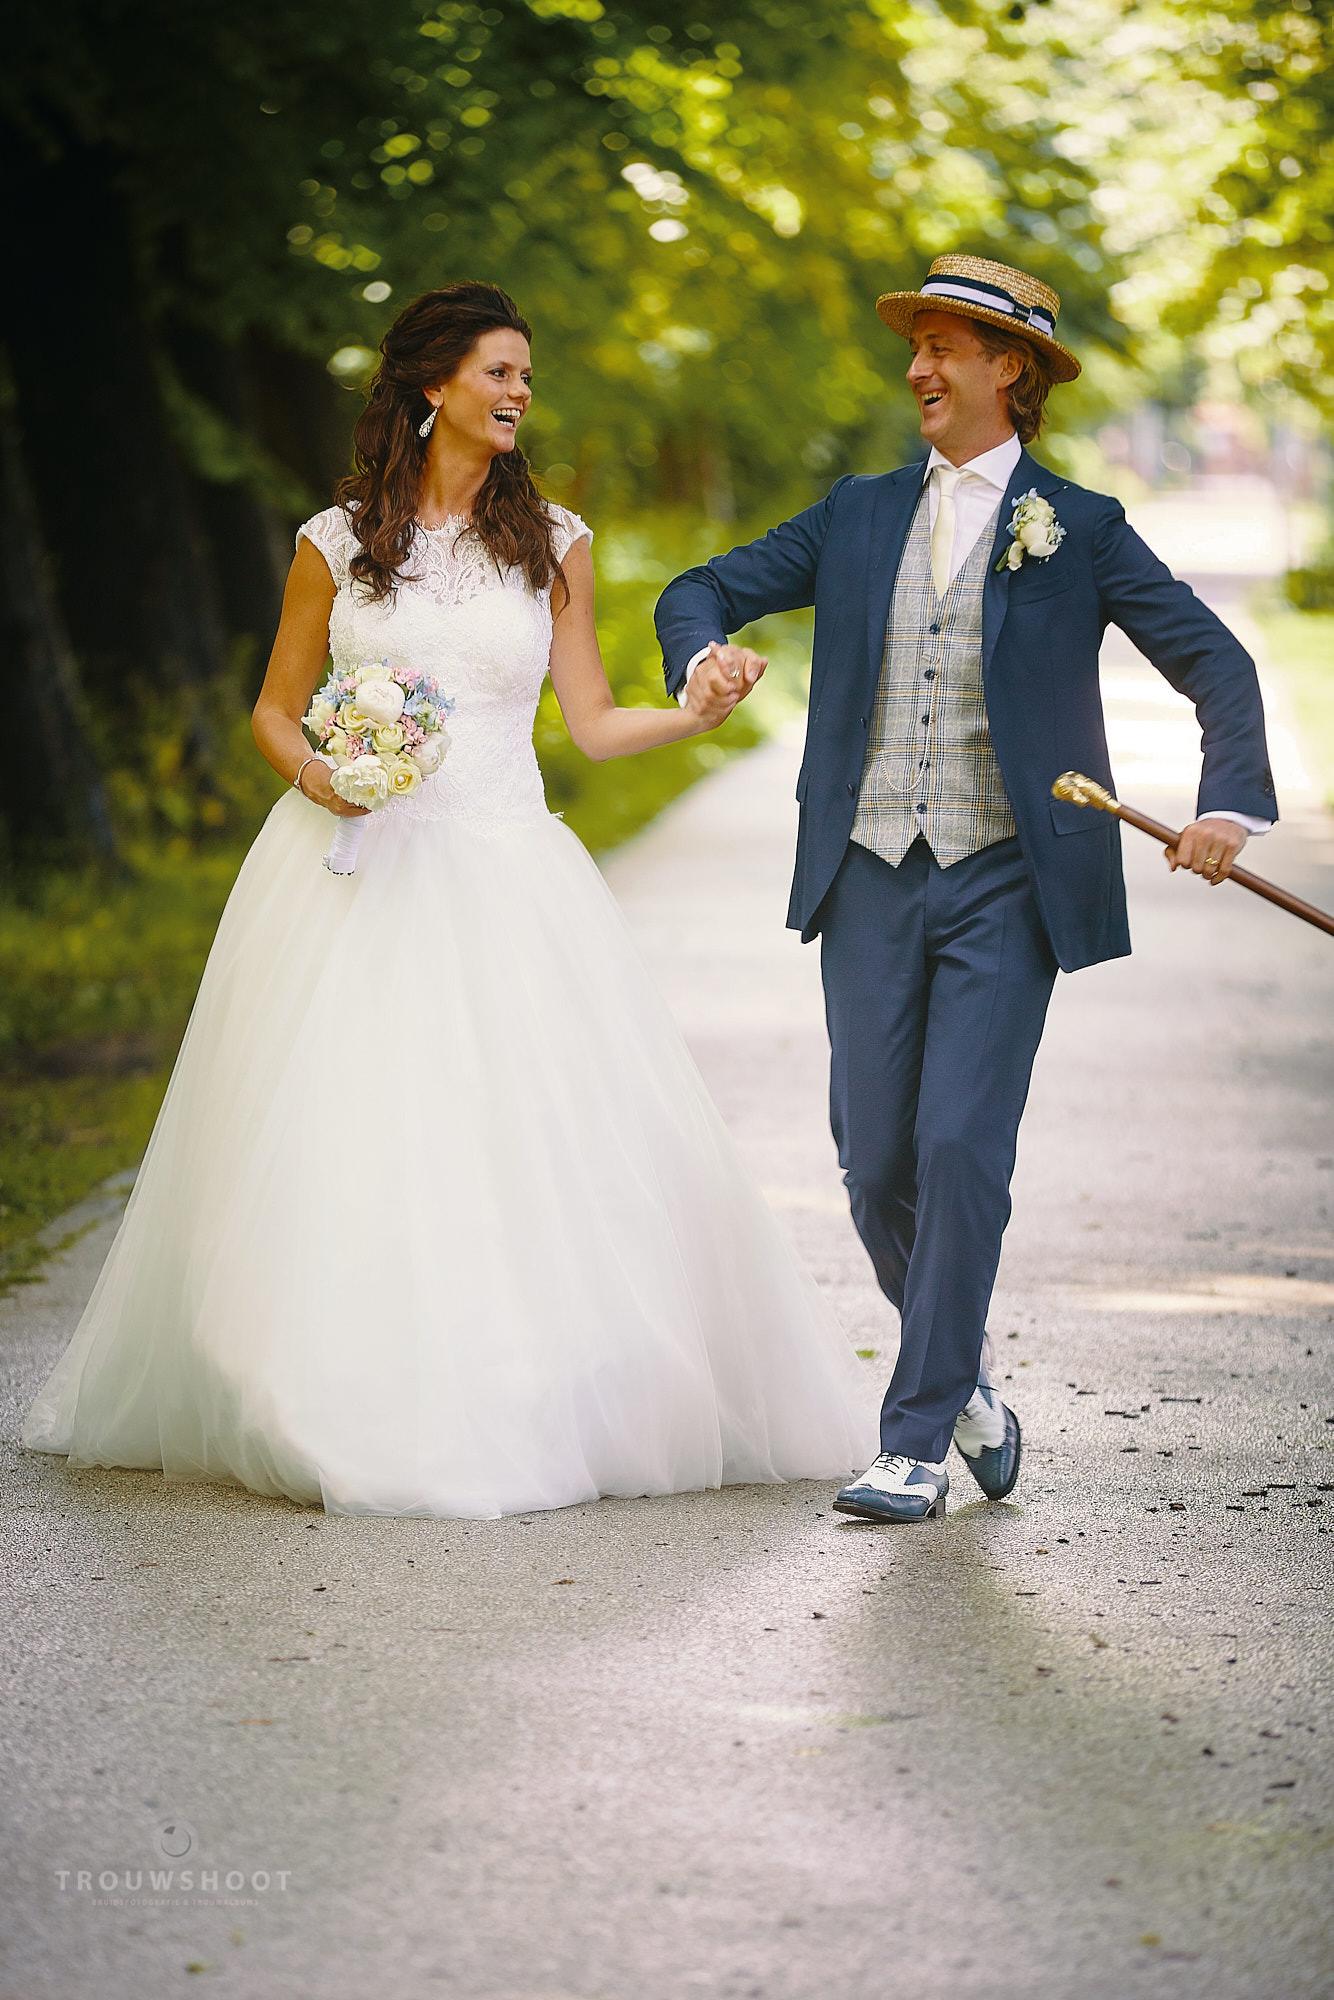 trouwshoot_bruidsfotografie_trouwfoto_299.jpg